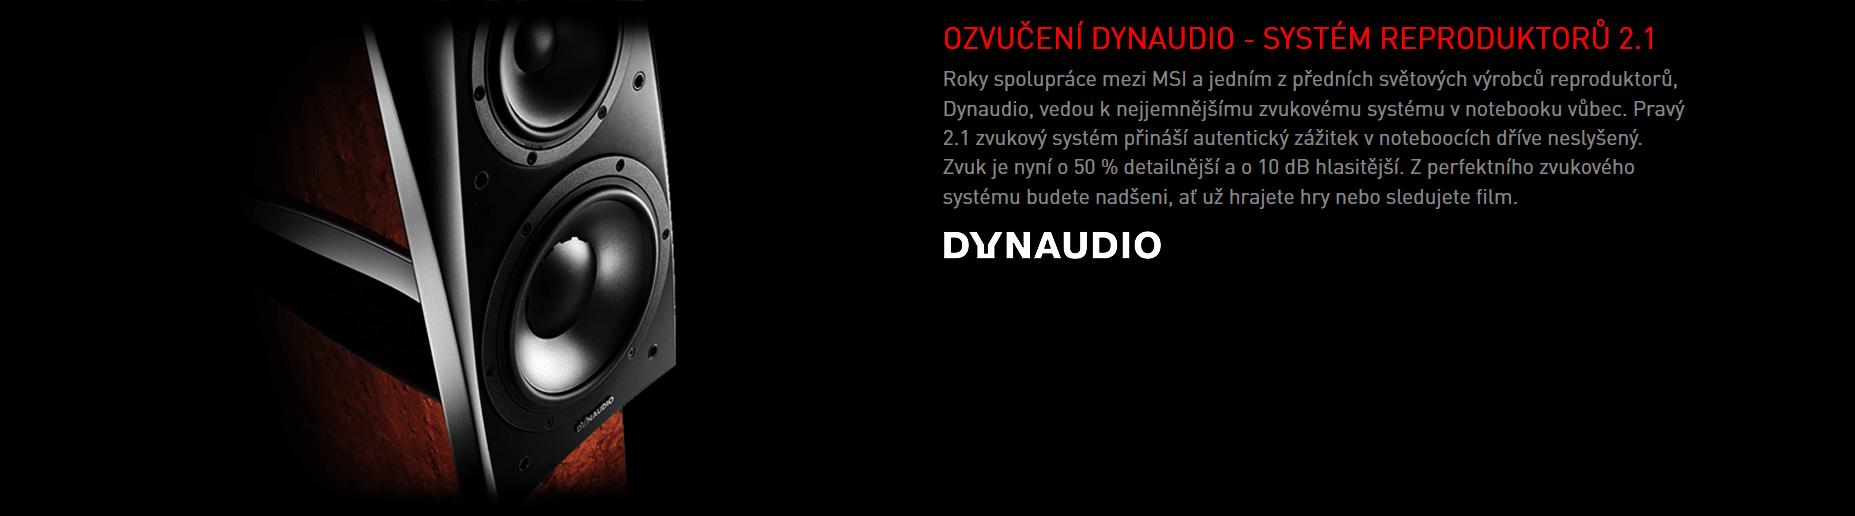 Ozvučení Dynaudio - systém reproduktorů 2.1